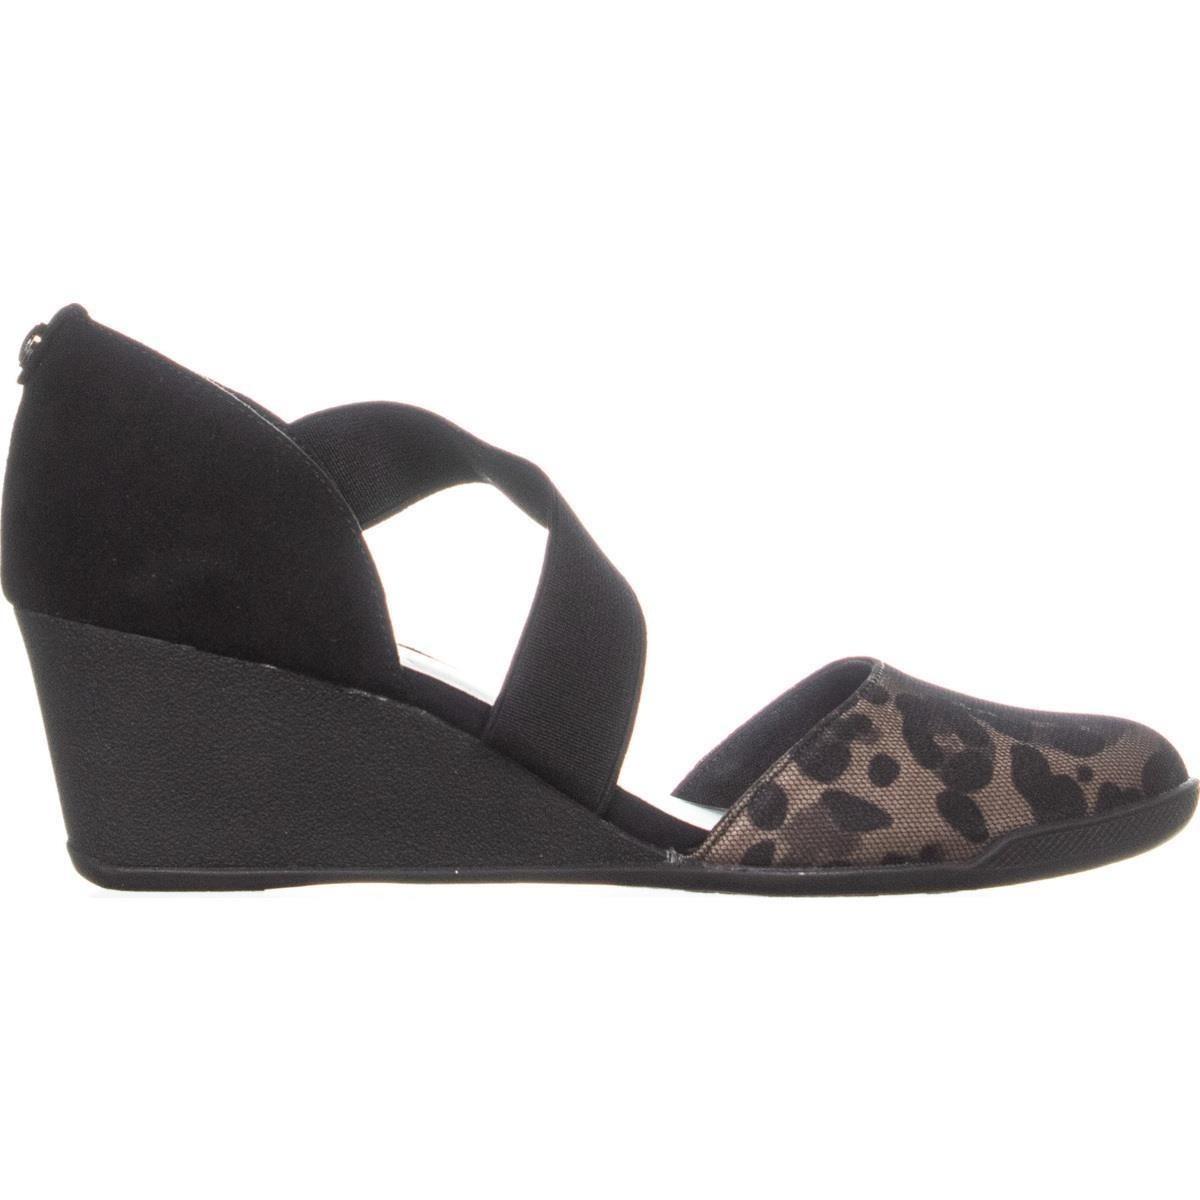 c72da52c39e Shop anne klein sport tara wedge sandals taupe black multi jpg 1200x1200 Anne  klein sport sandals